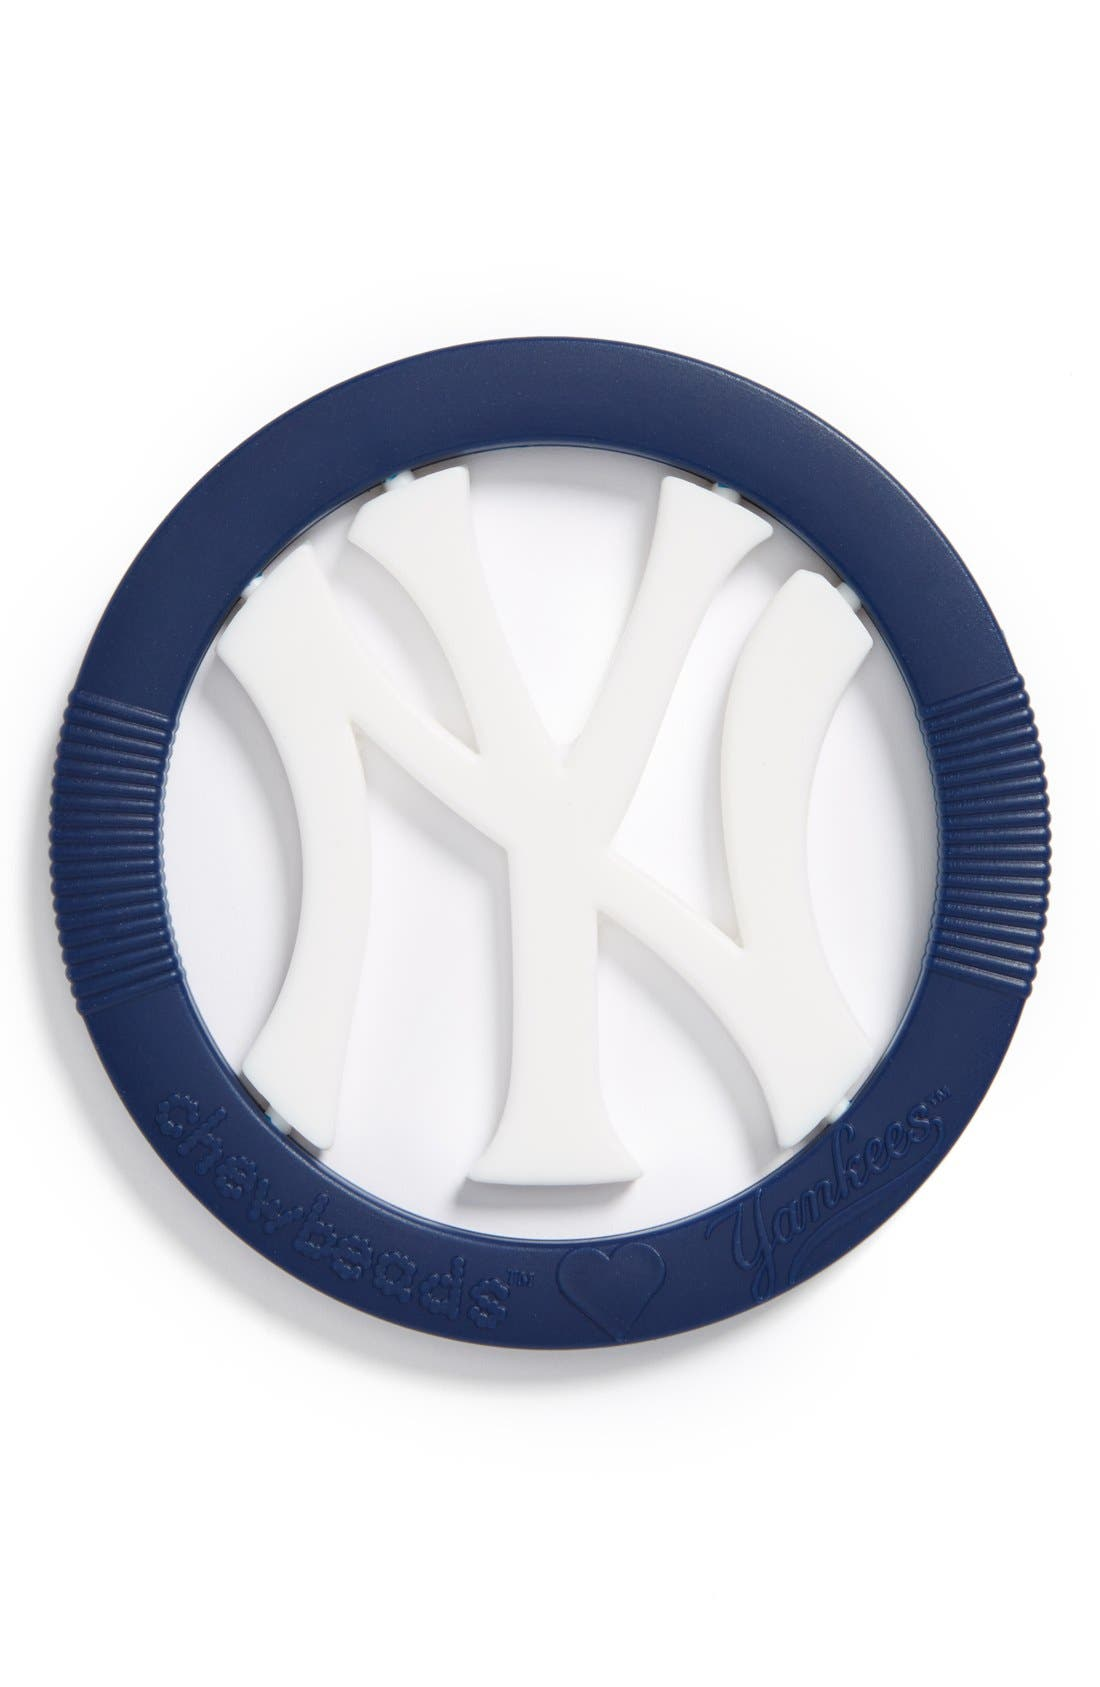 Alternate Image 1 Selected - Chewbeads 'New York Yankees - Gameday' Teether